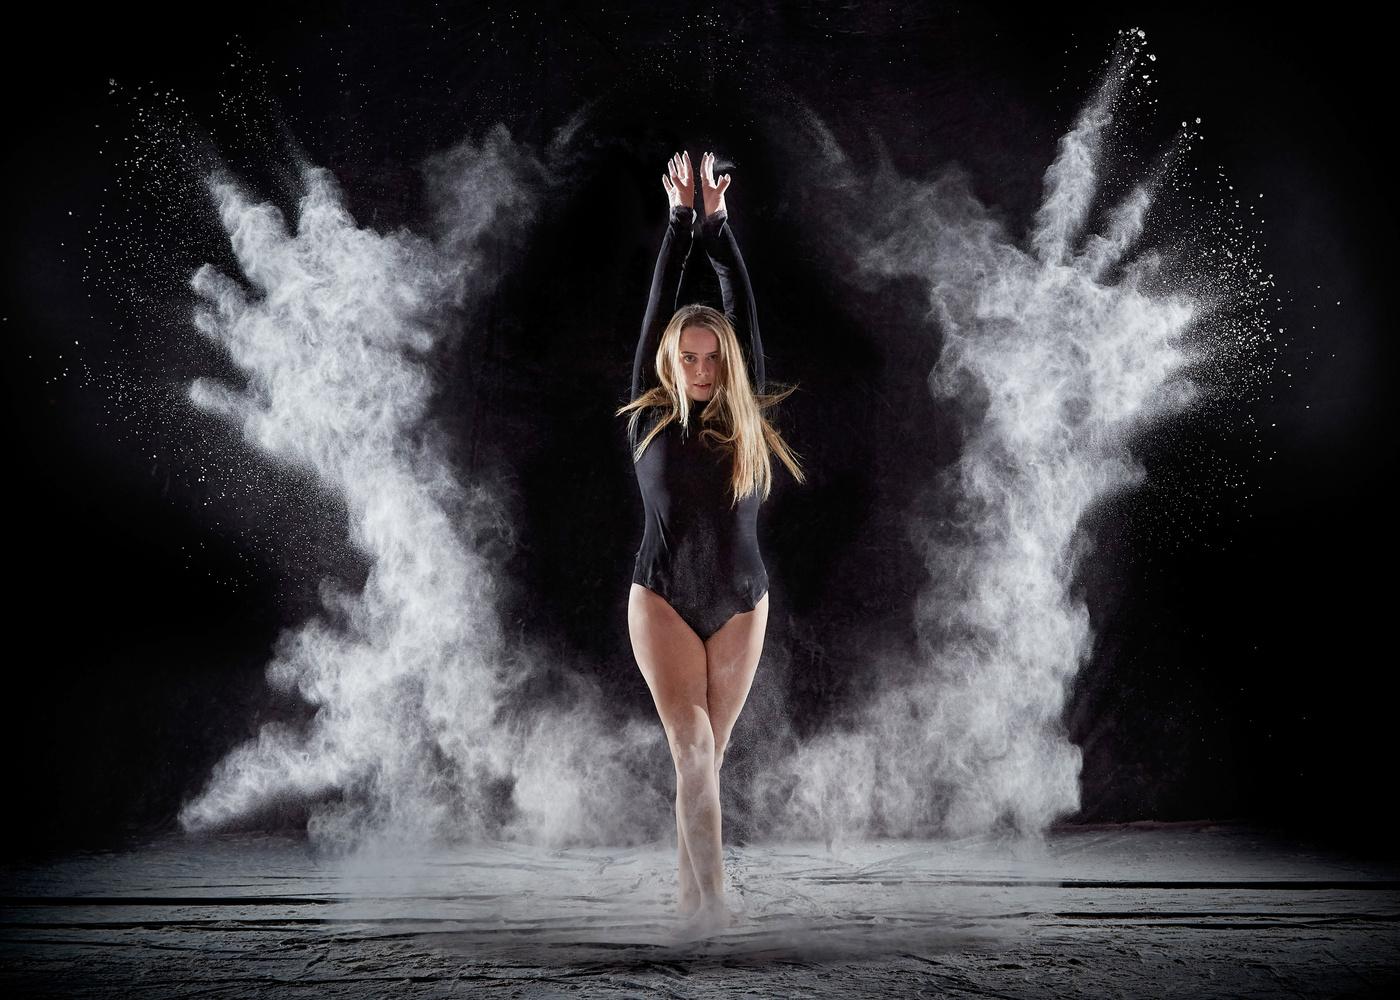 The Wings of an Angel by Hank Rintjema